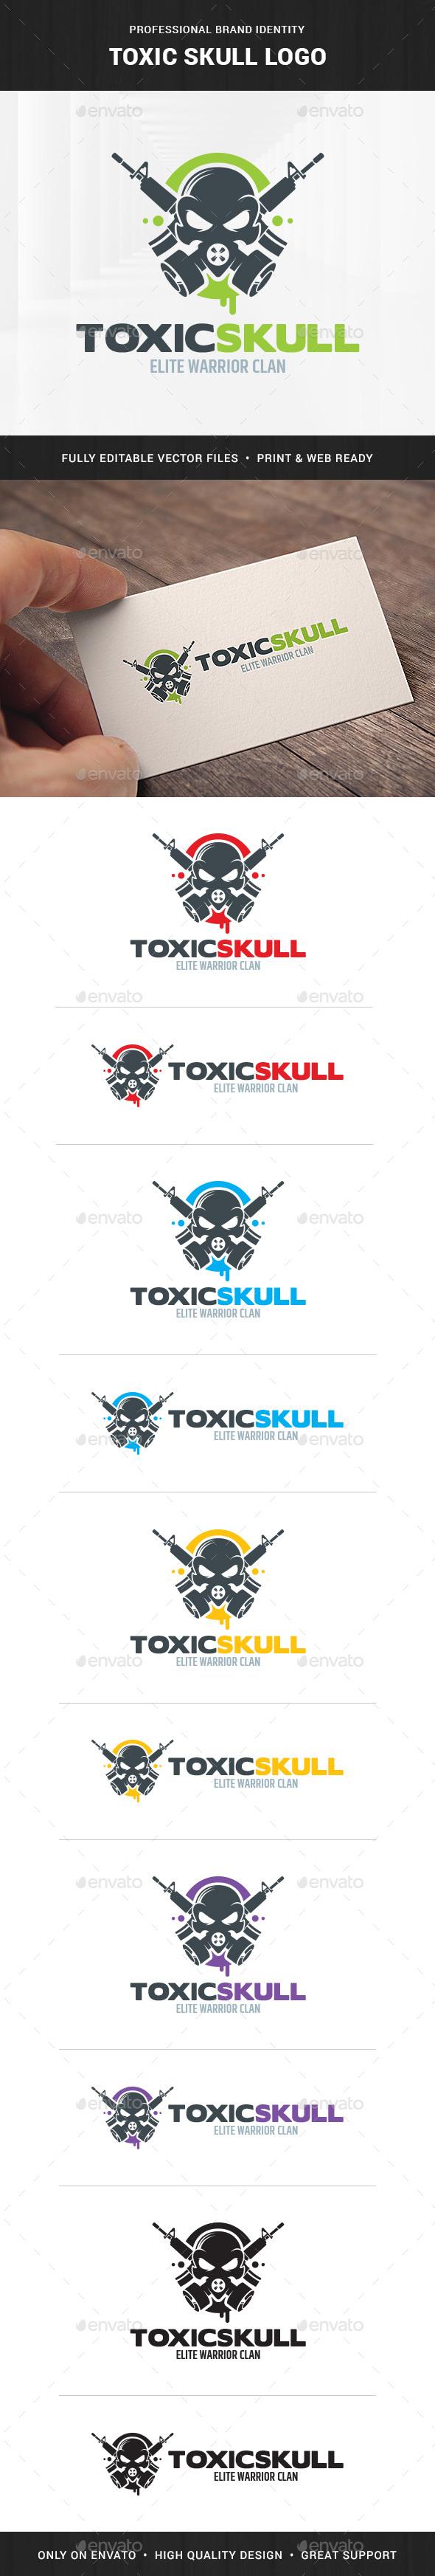 Toxic Skull Logo Template